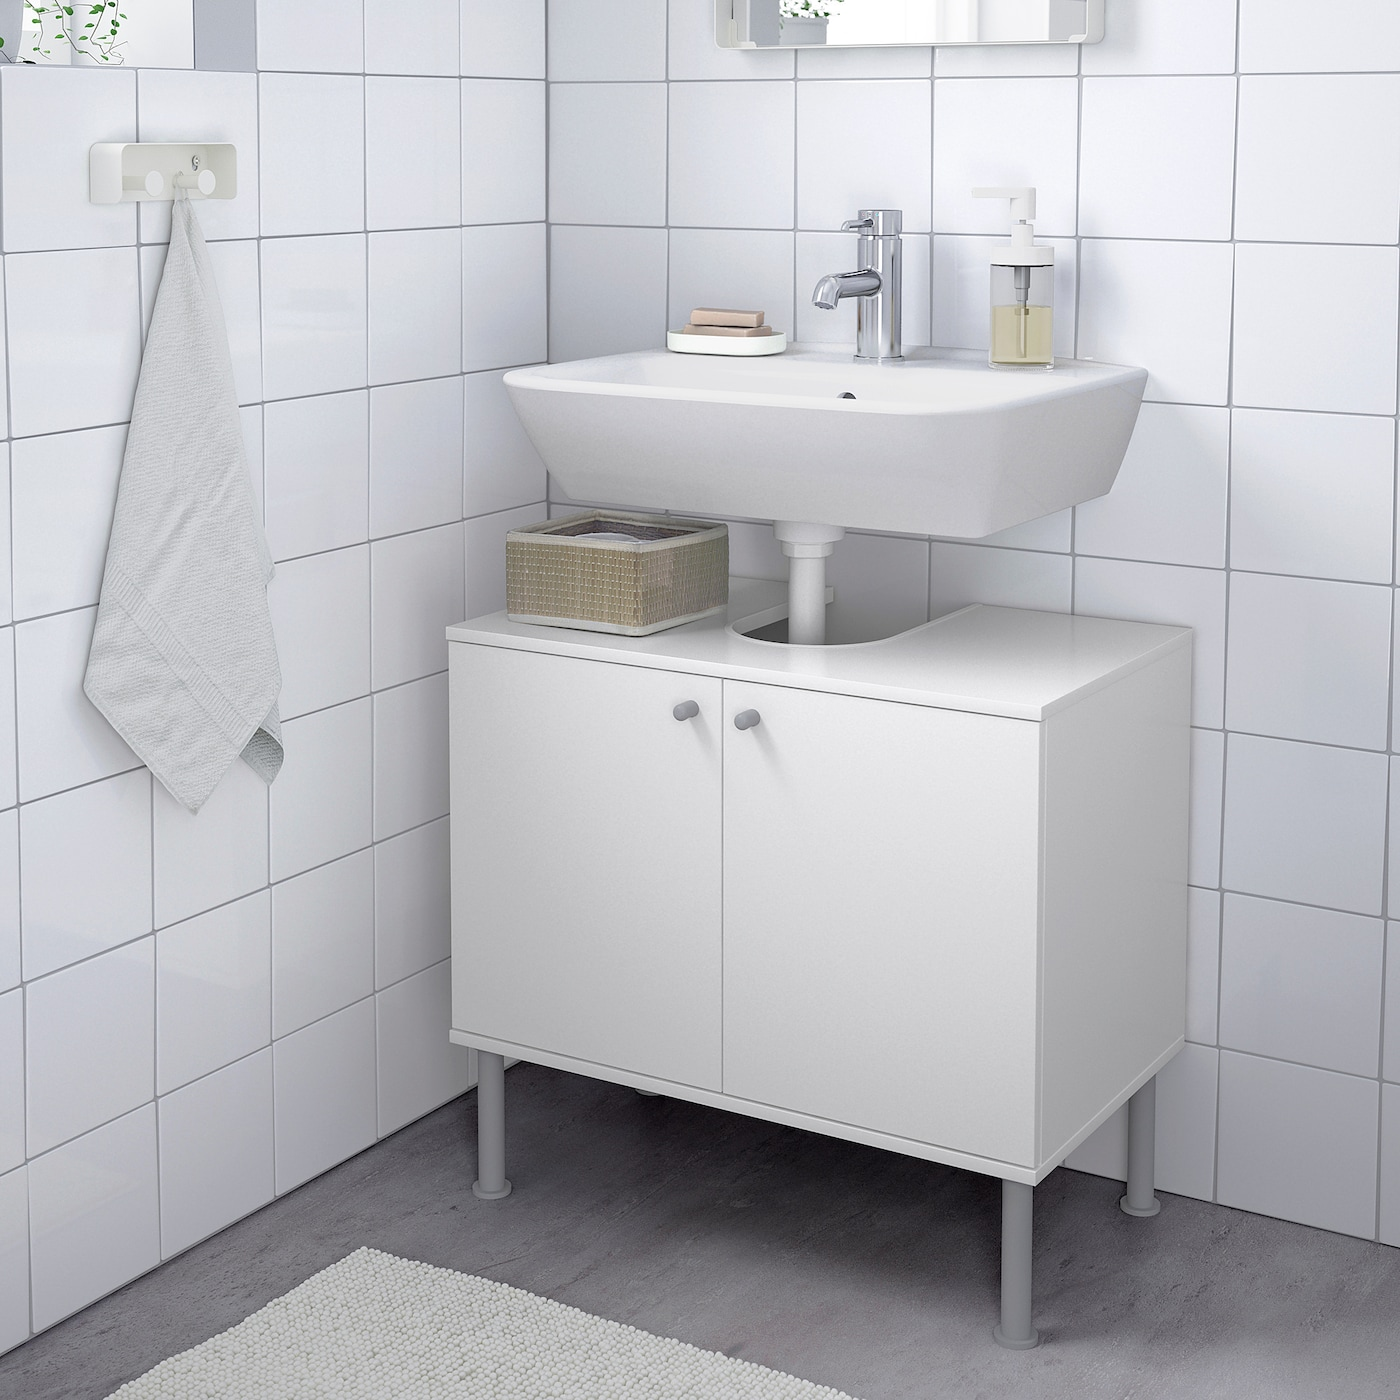 FULLEN Wash-basin base cabinet w 9 doors - white 9x9 cm